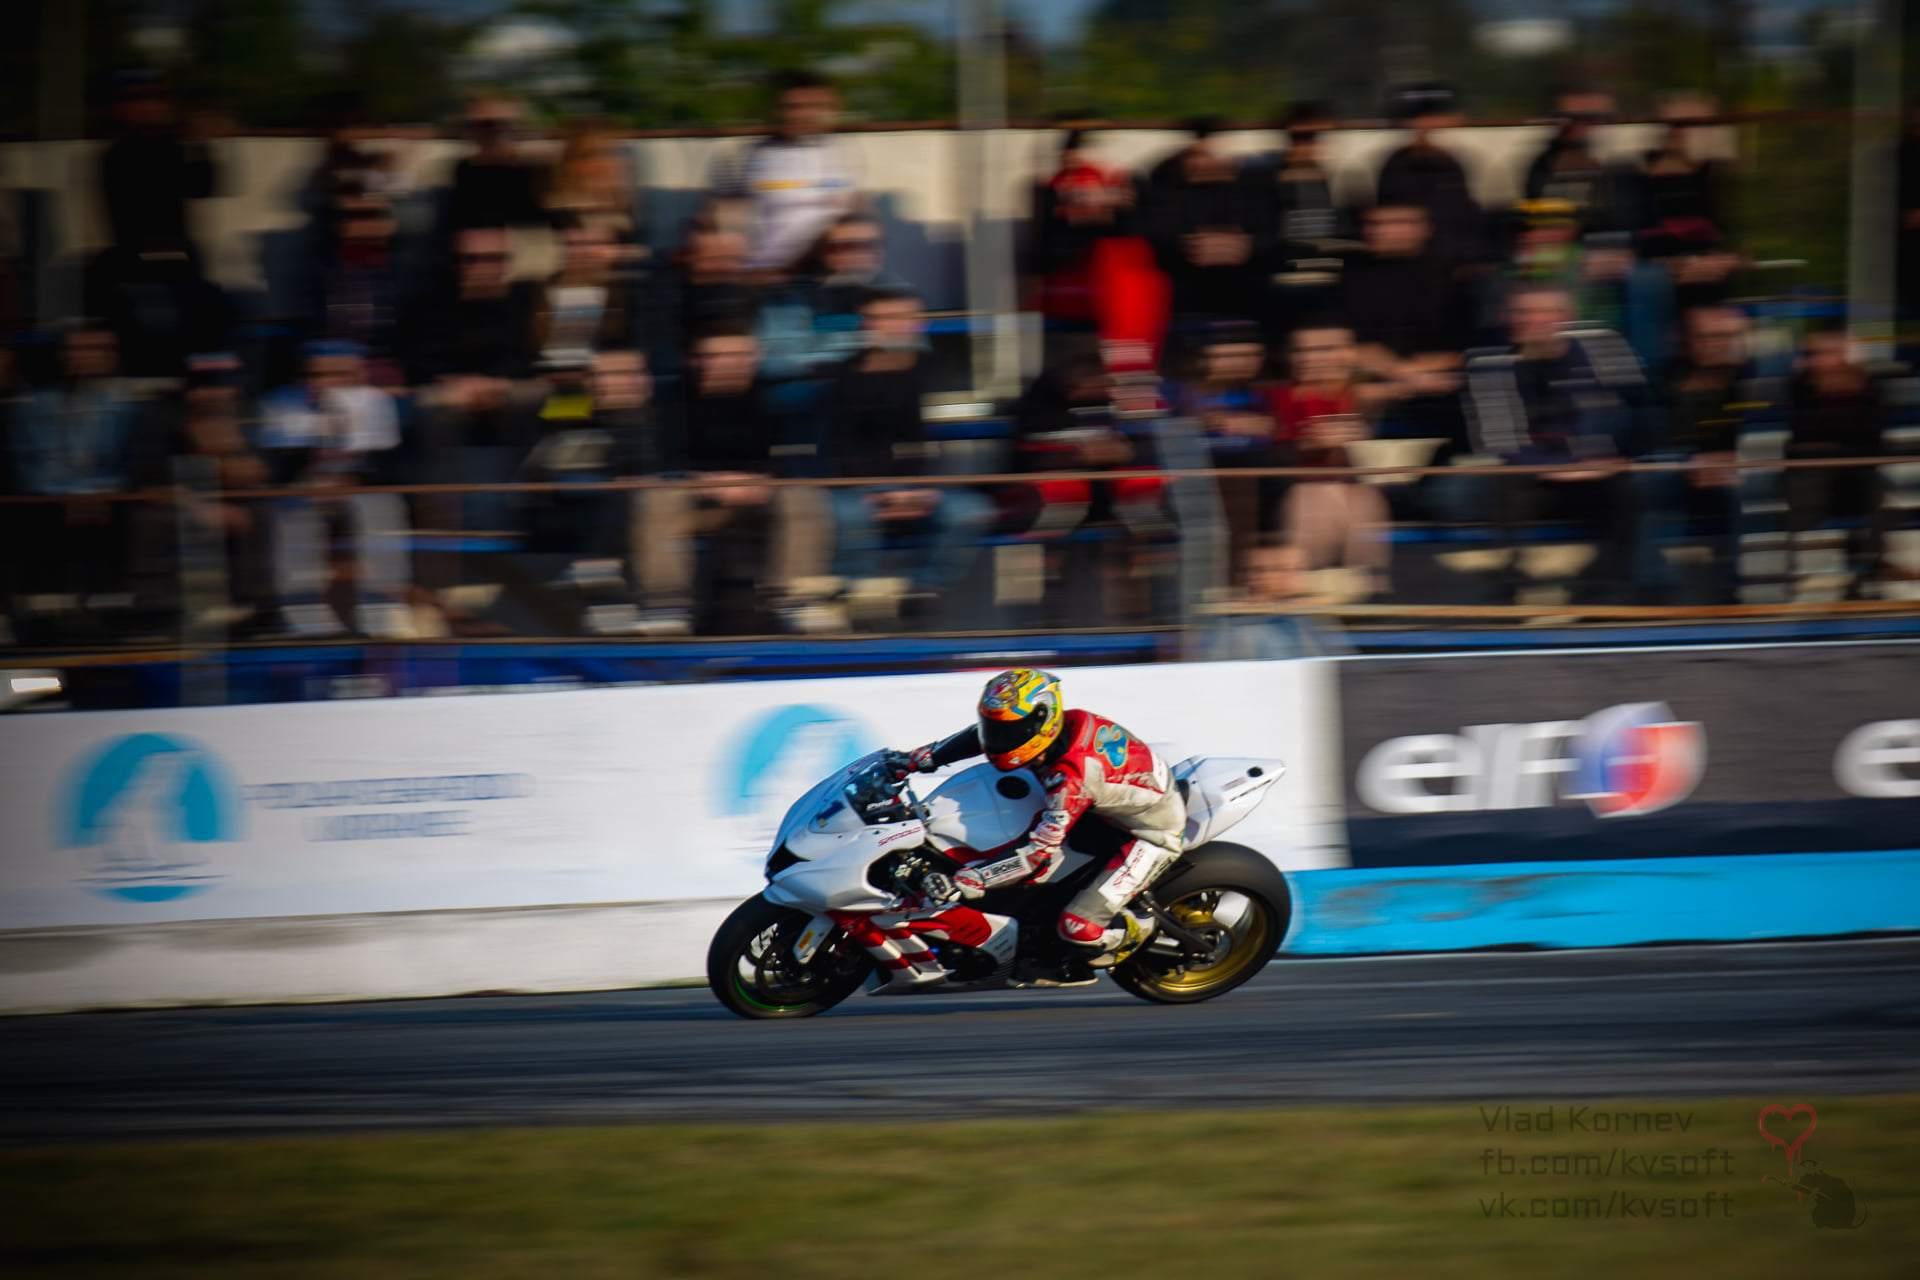 5-6_etap_MotoGPUkraine_027